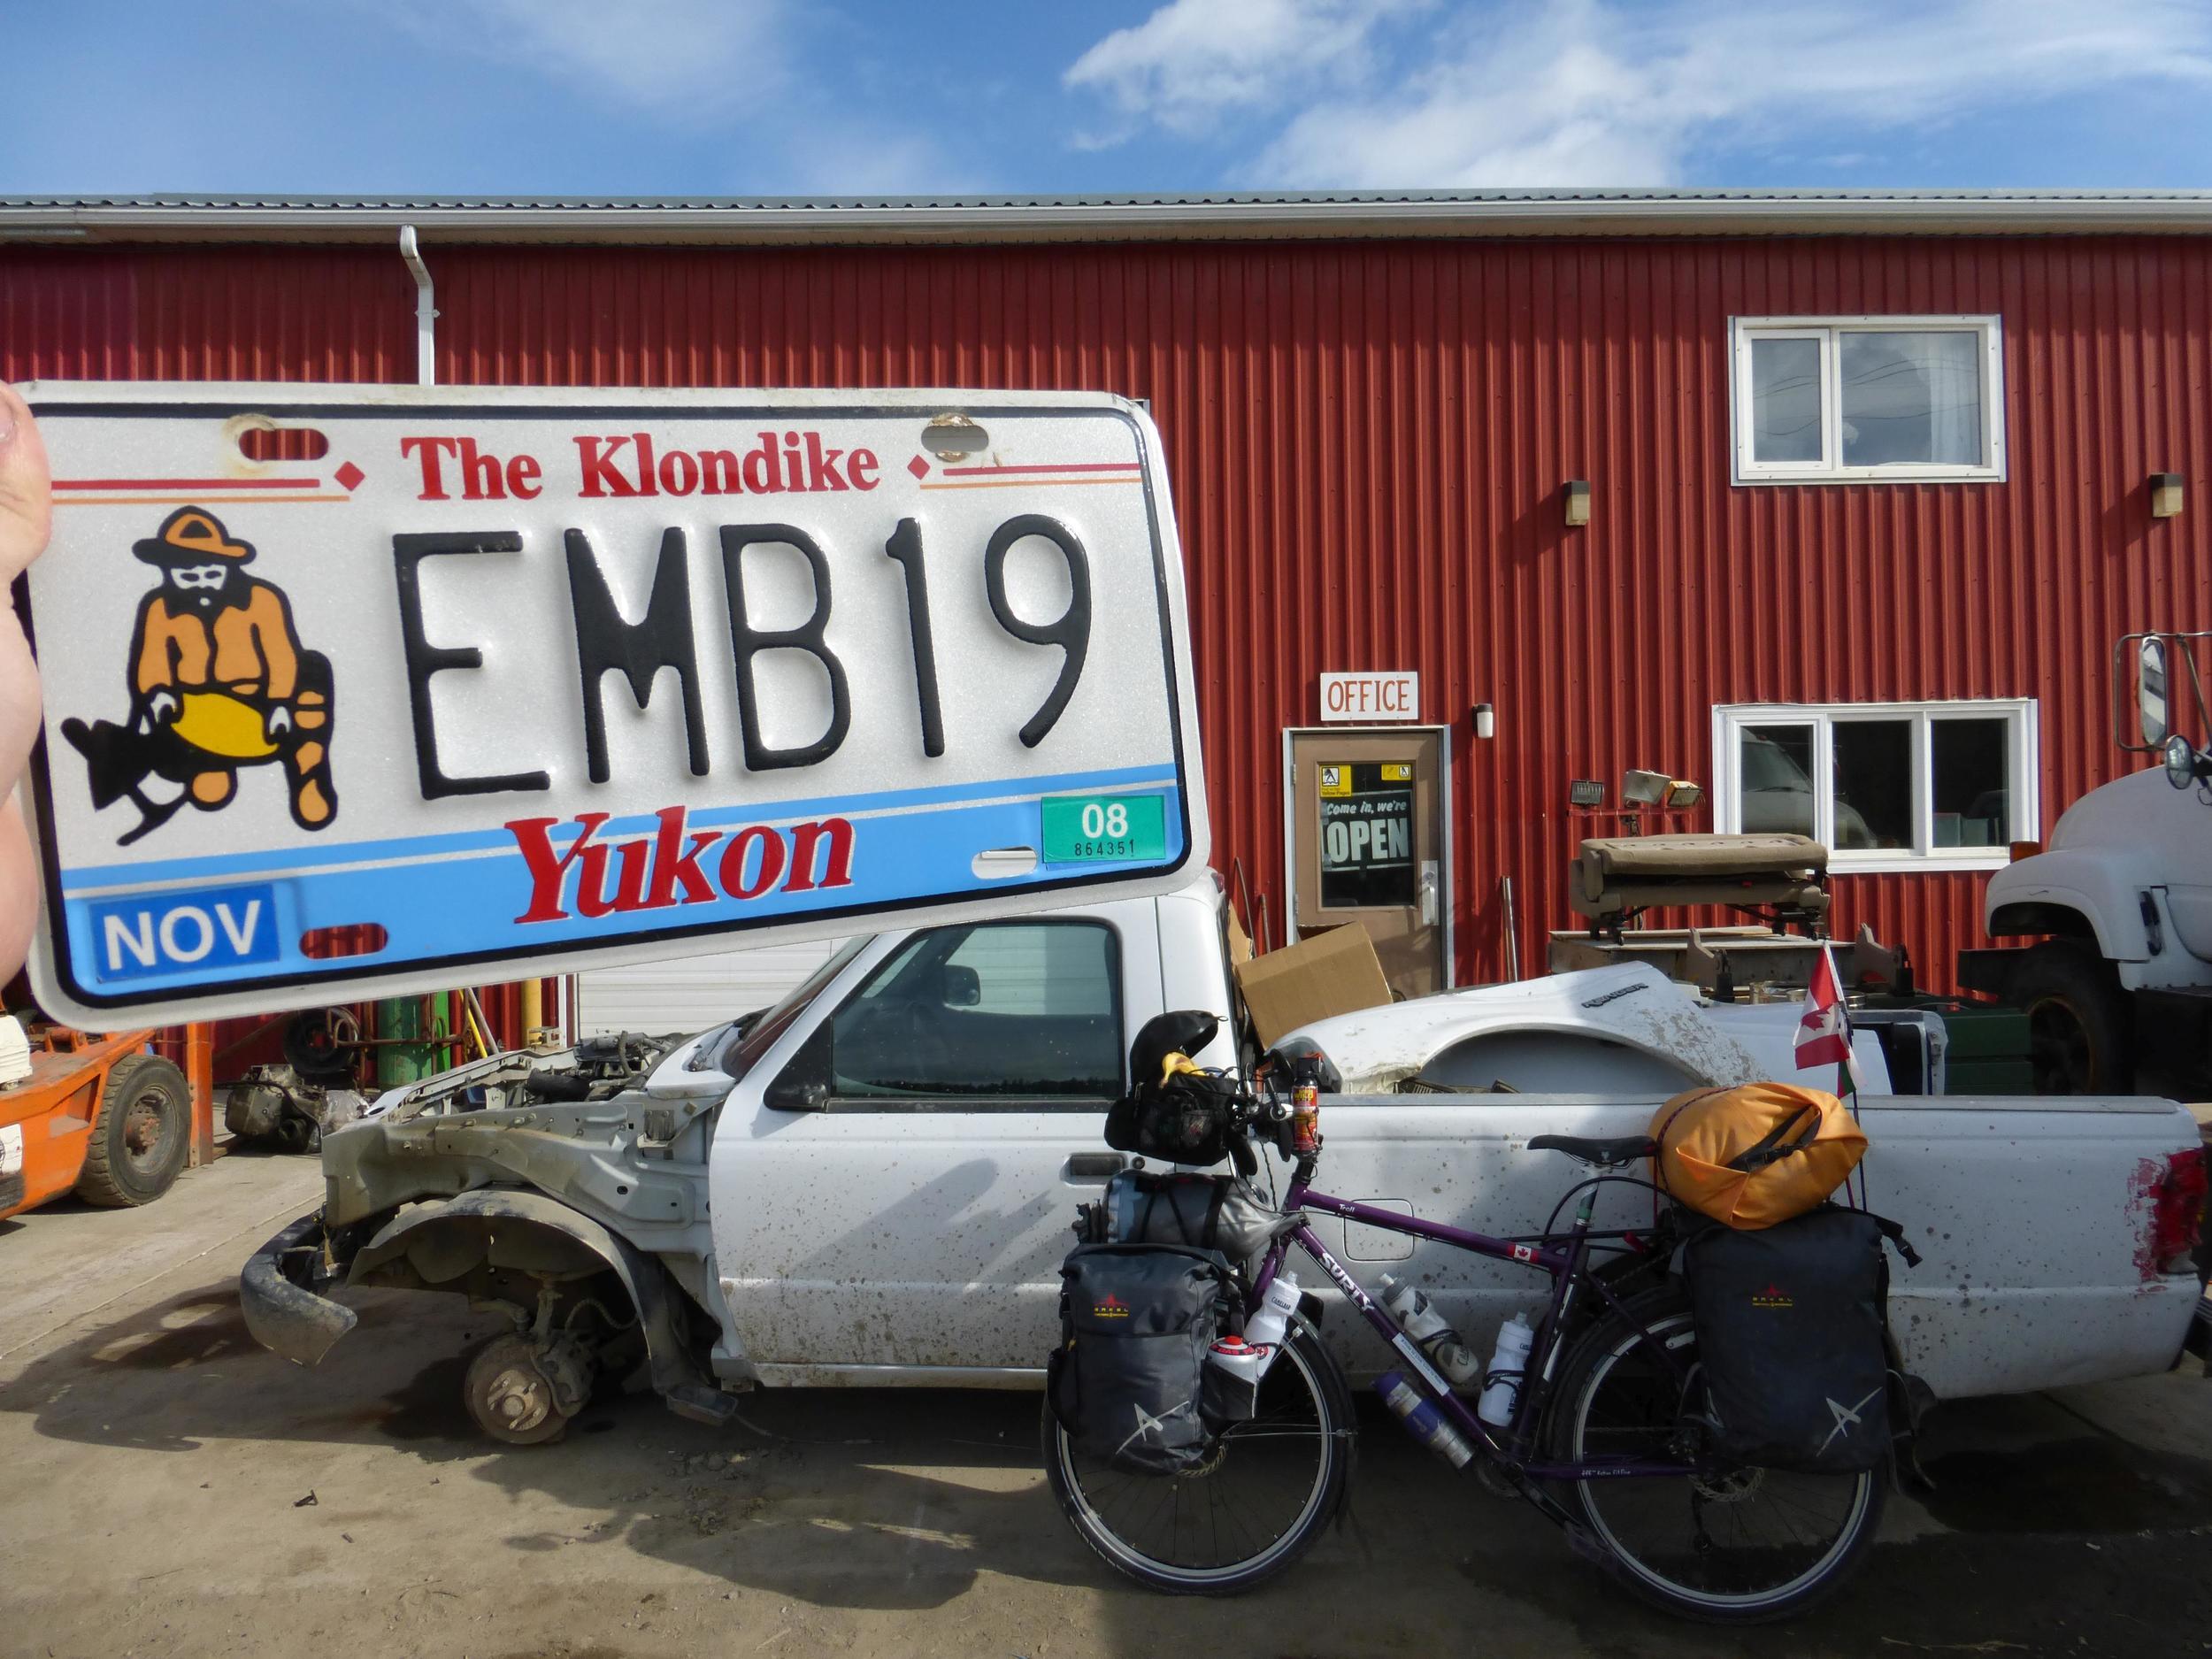 I got my Yukon license plate at the Klondike Highway turnoff